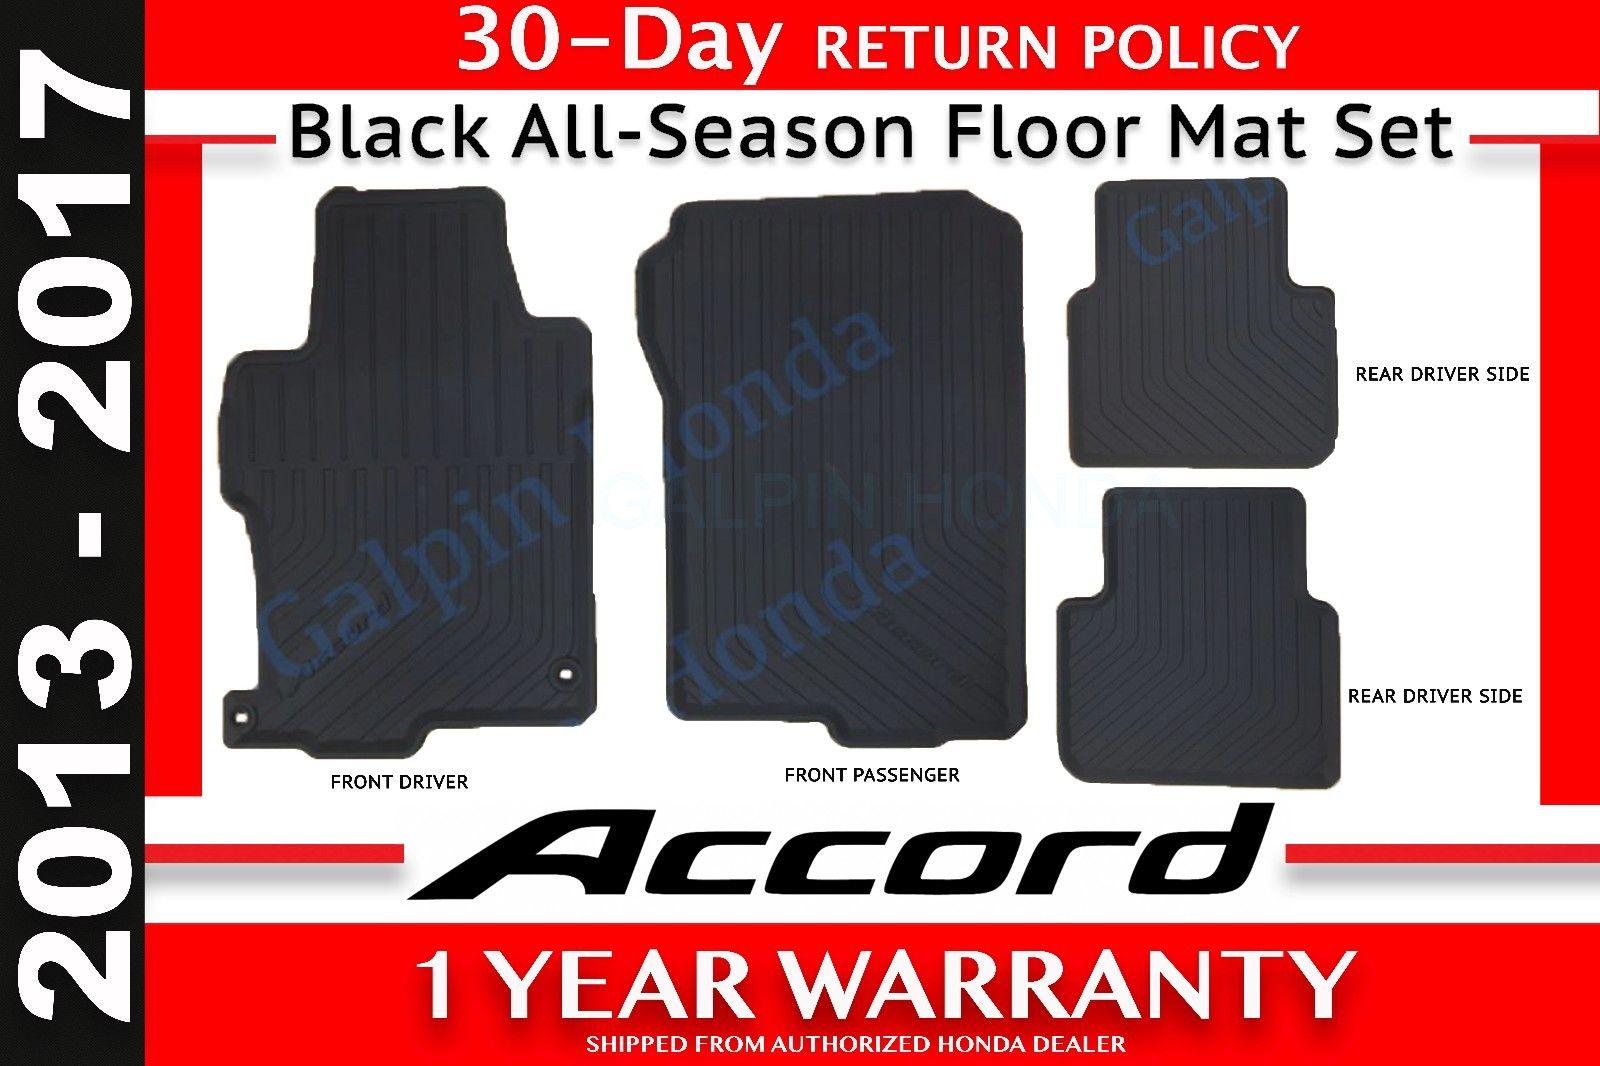 Genuine Oem Honda Accord 4 Dr Black All Season Floor Mat Set 13 17